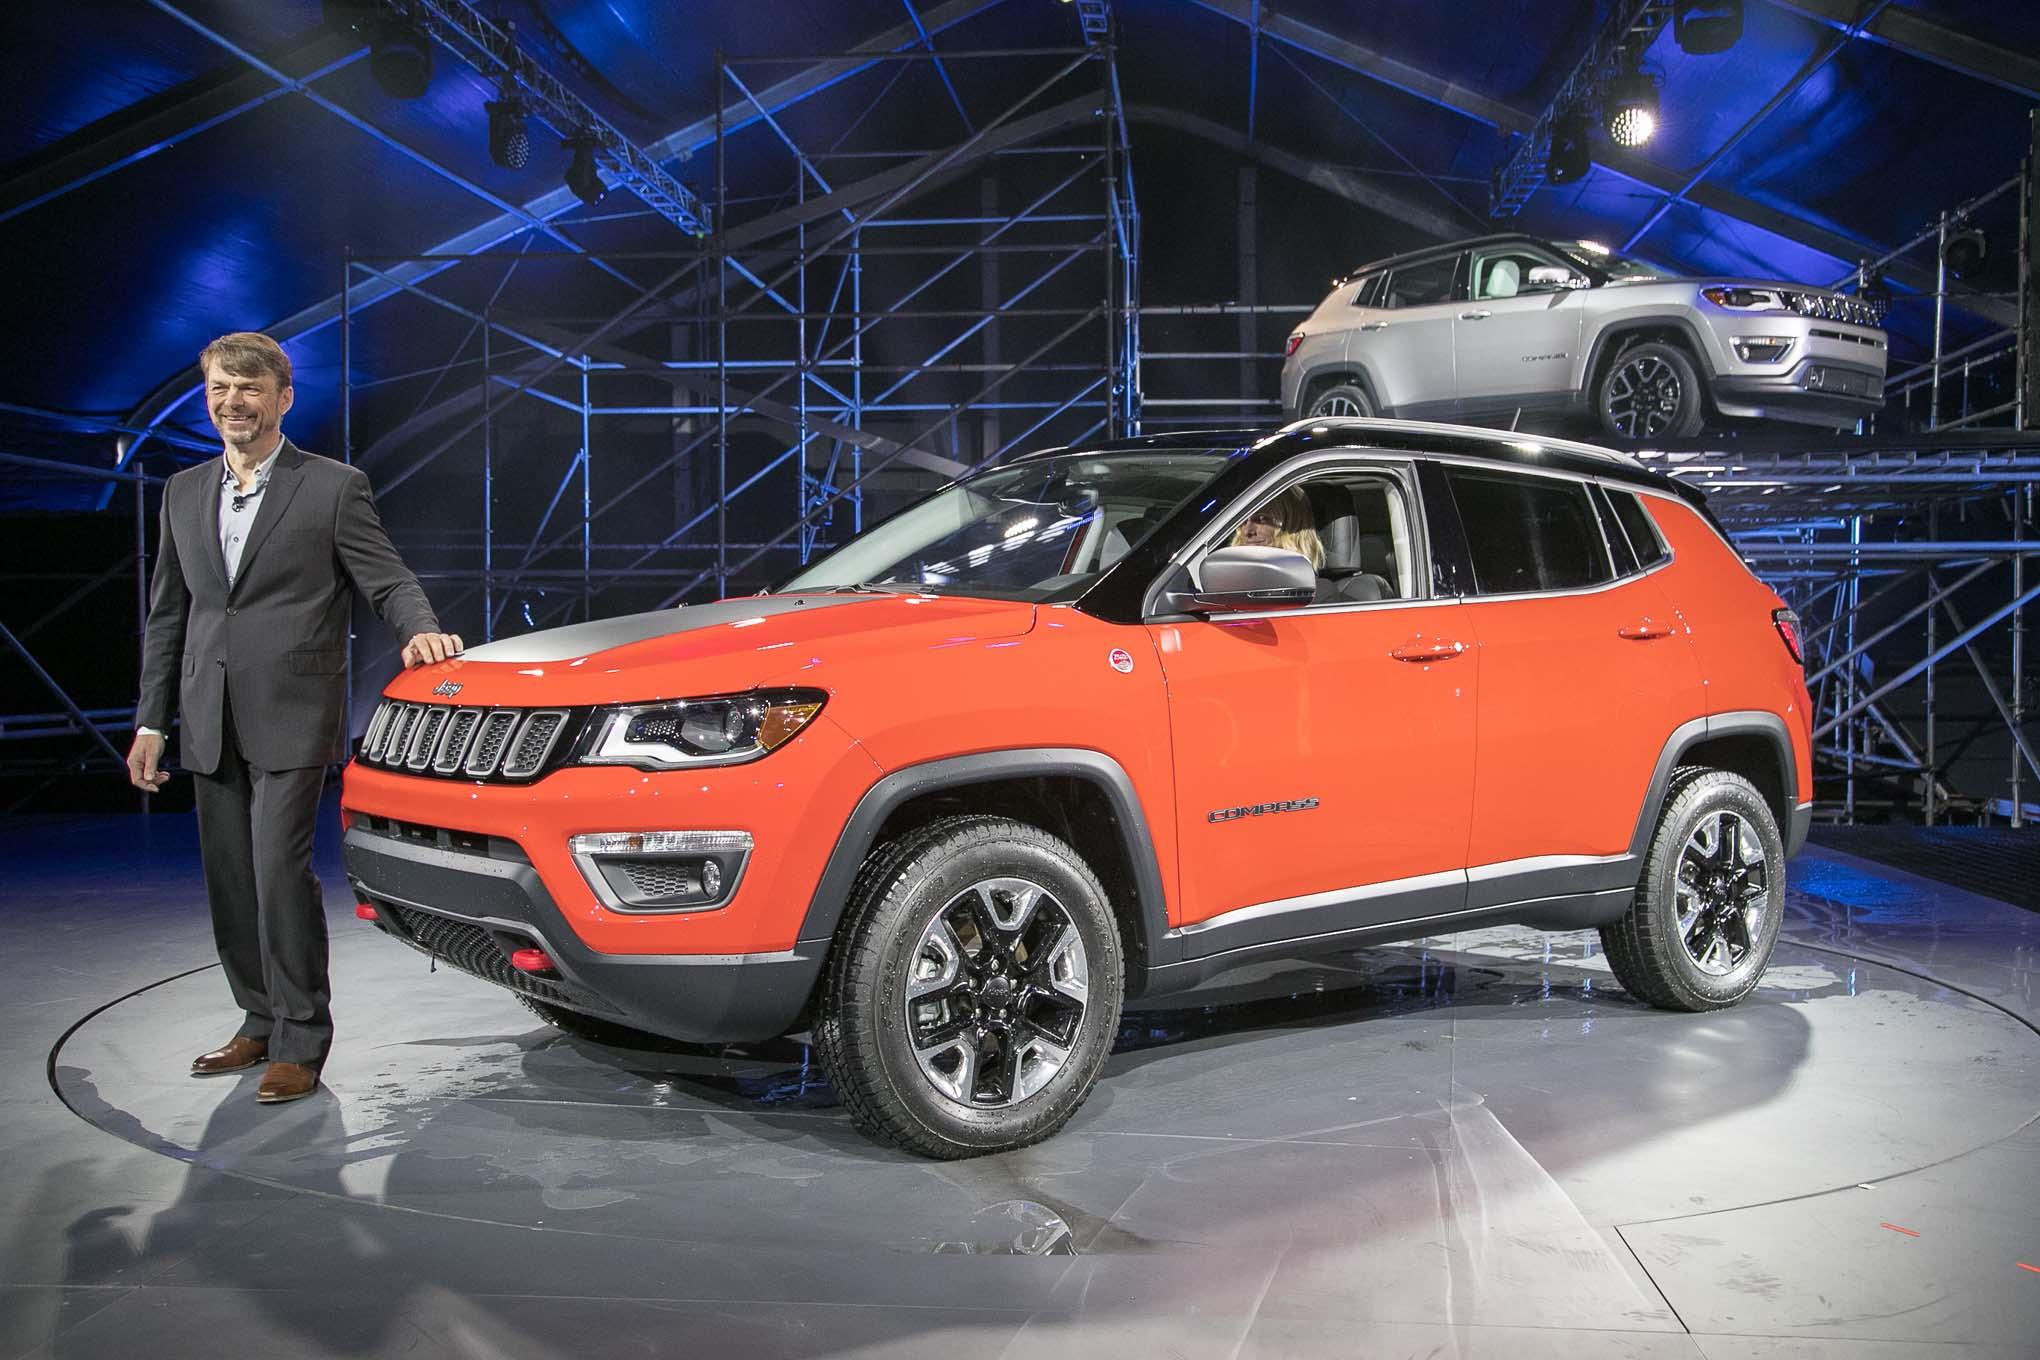 2017 Jeep Compass Trailhawk Front Three Quarter 02 1